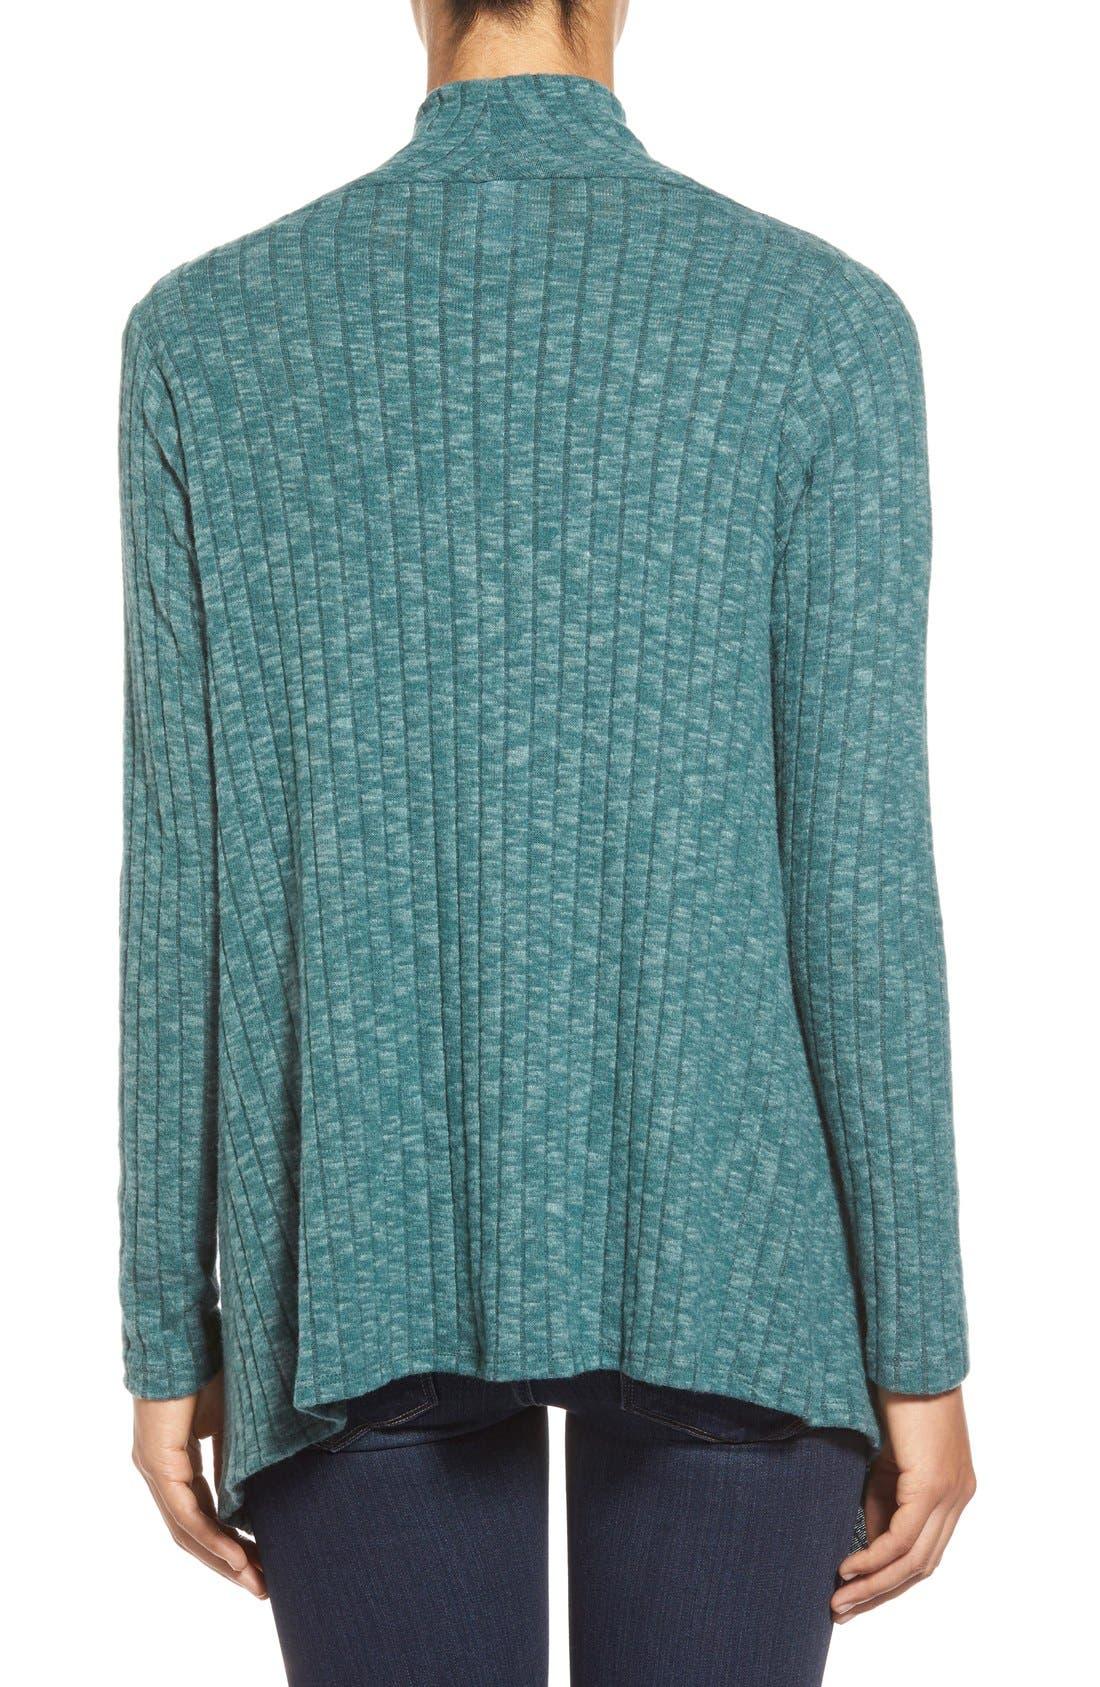 Alternate Image 2  - Bobeau One-Button Fuzzy Fleece Wrap Cardigan (Regular & Petite)